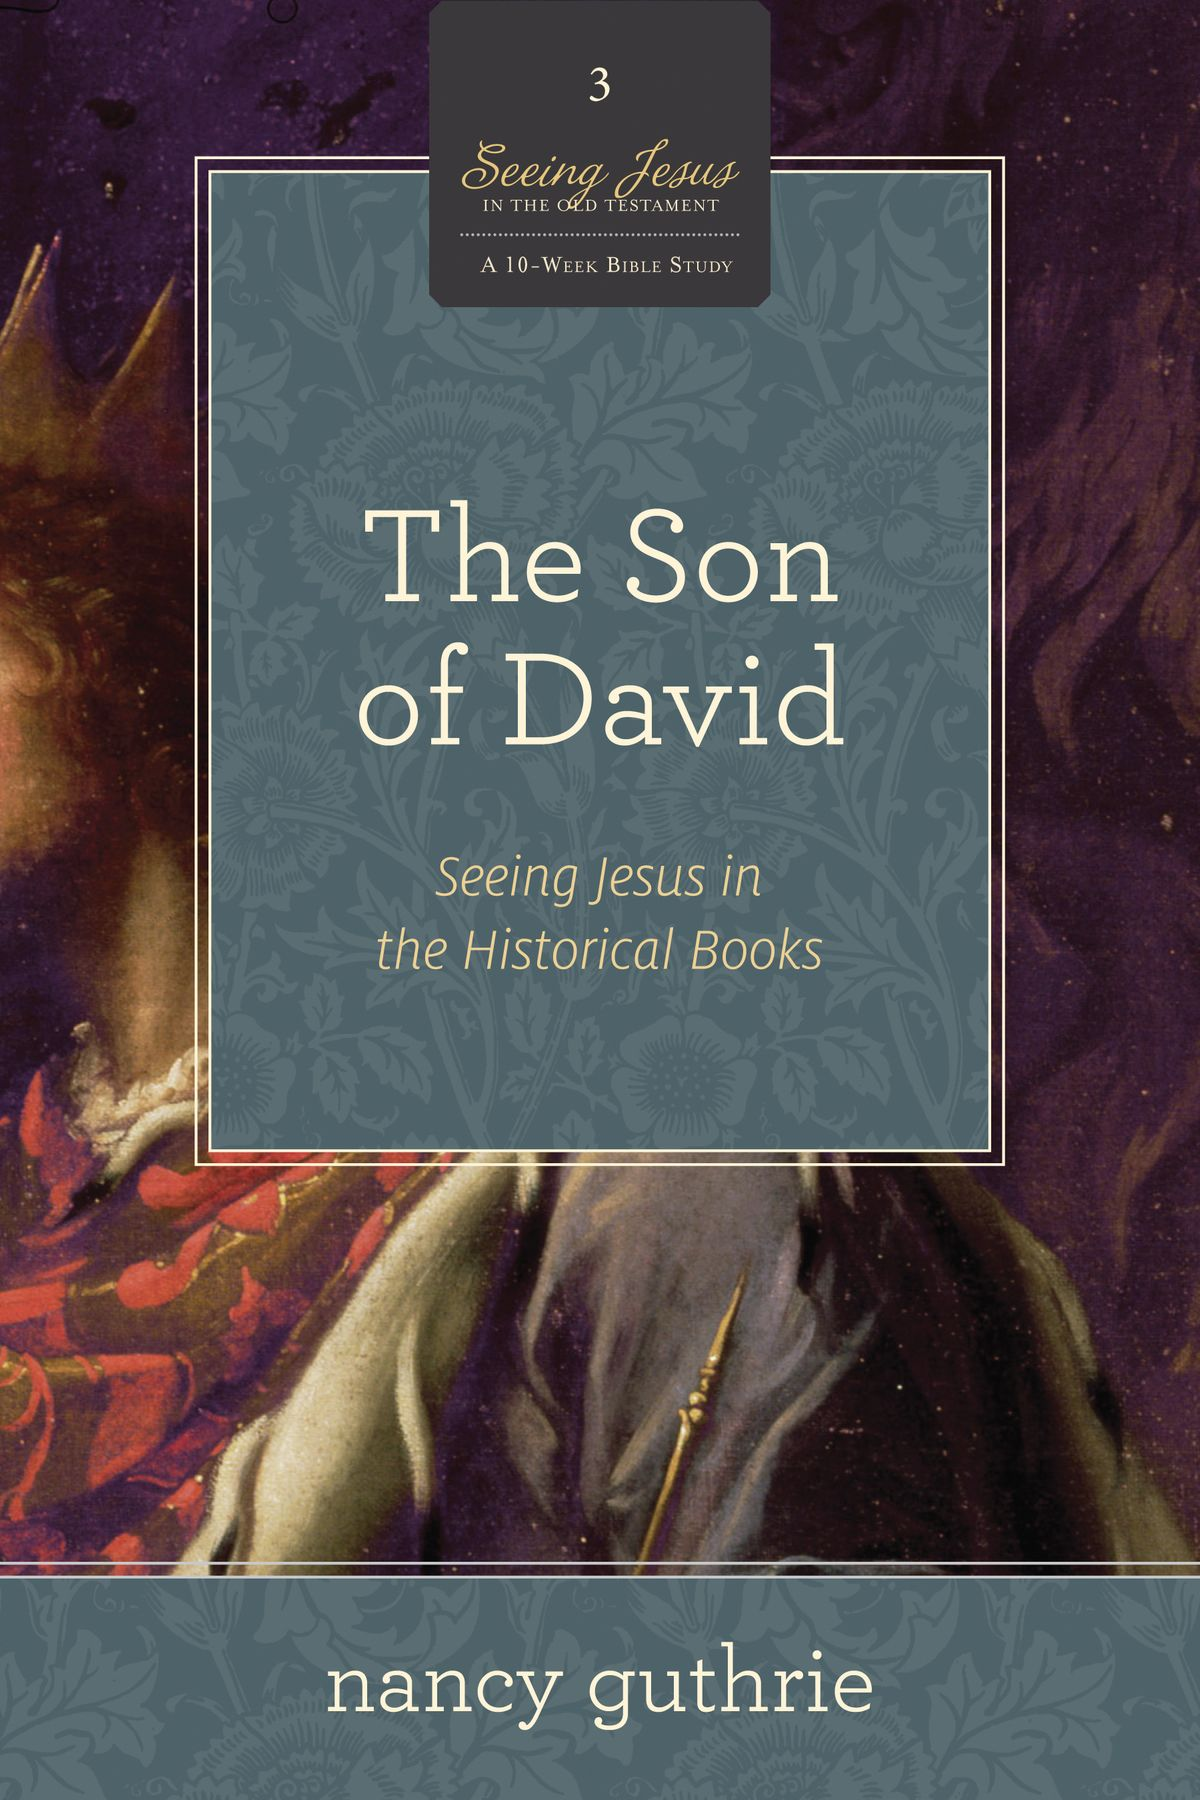 the-son-of-david-a-10-week-bible-study.jpg